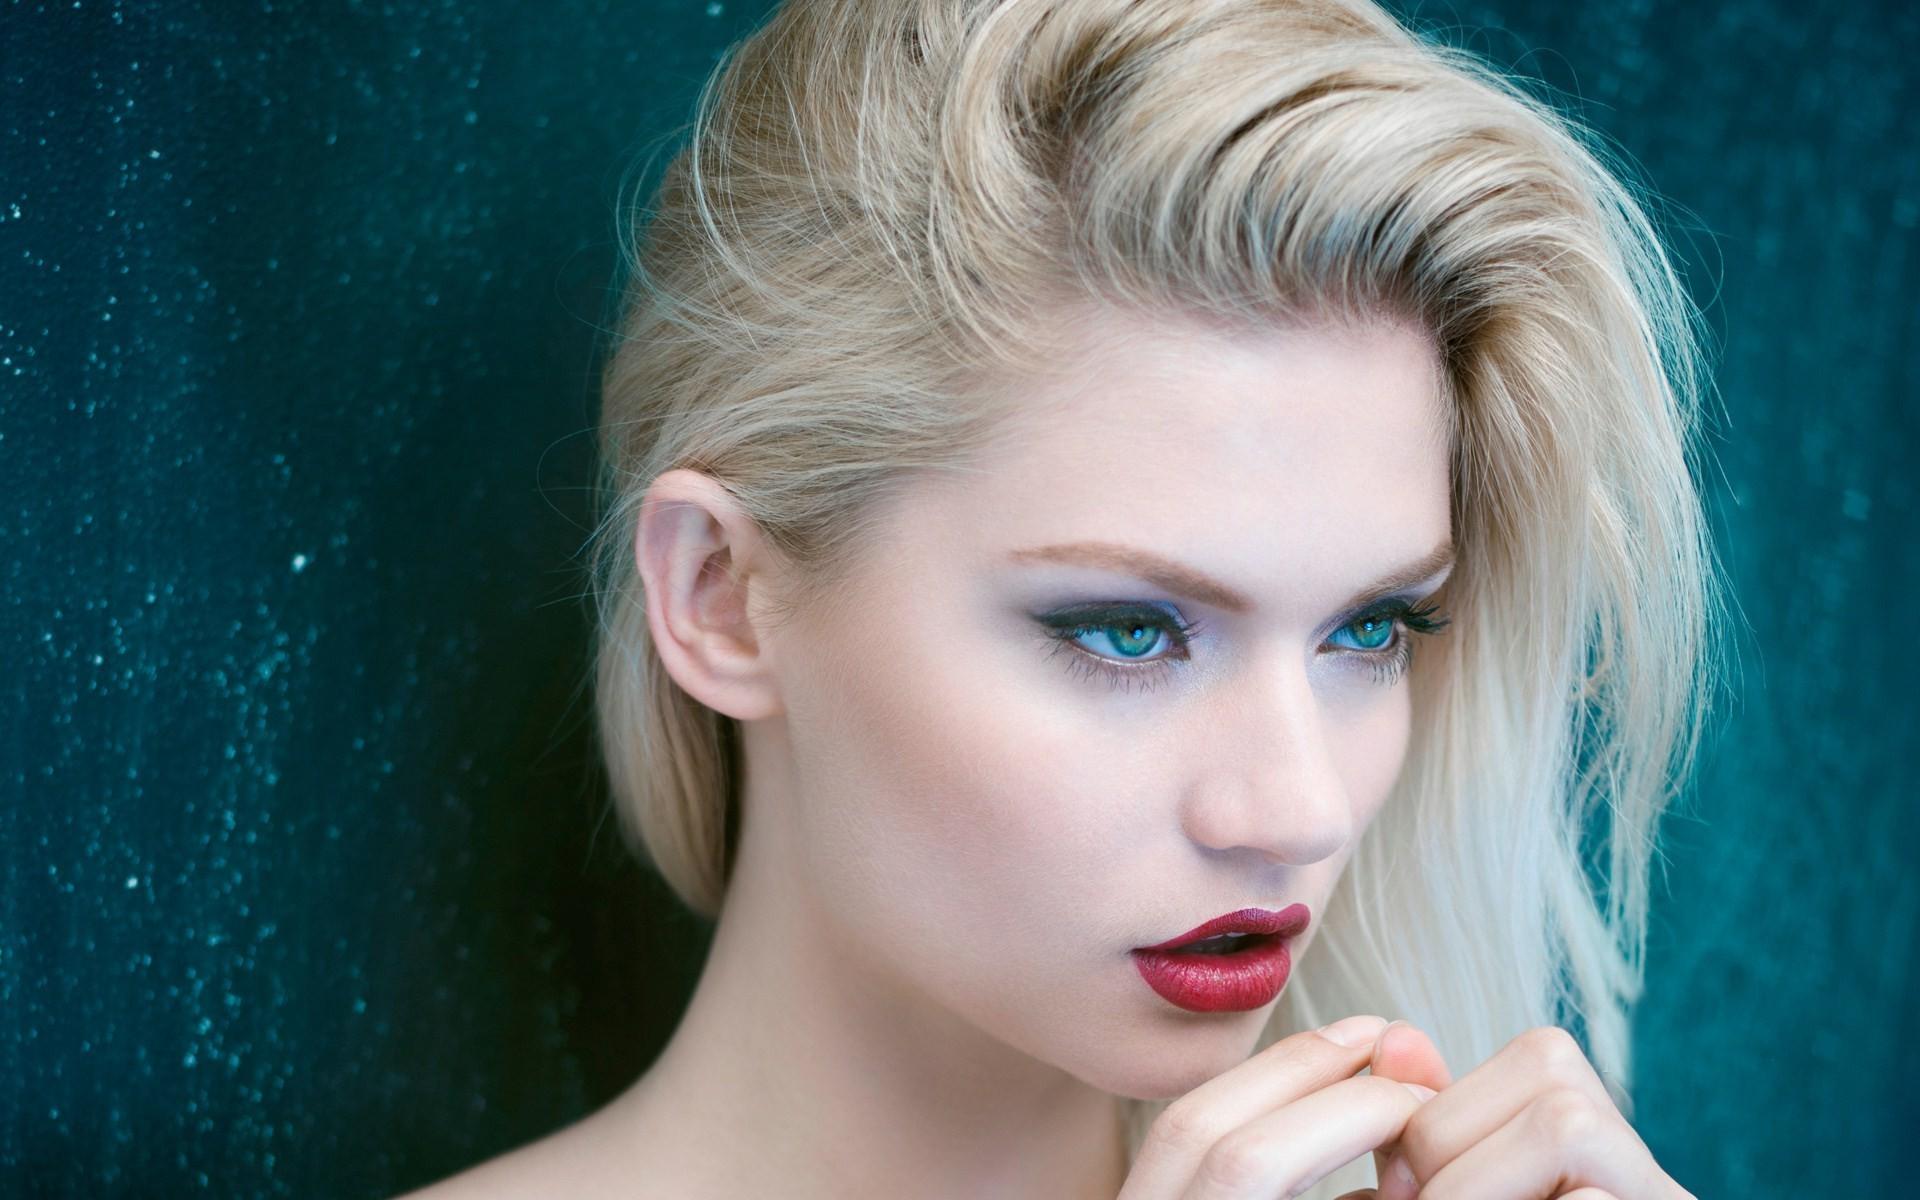 Wallpaper Face Women Model Blonde Long Hair Blue: Wallpaper : Face, Women, Model, Blonde, Long Hair, Blue